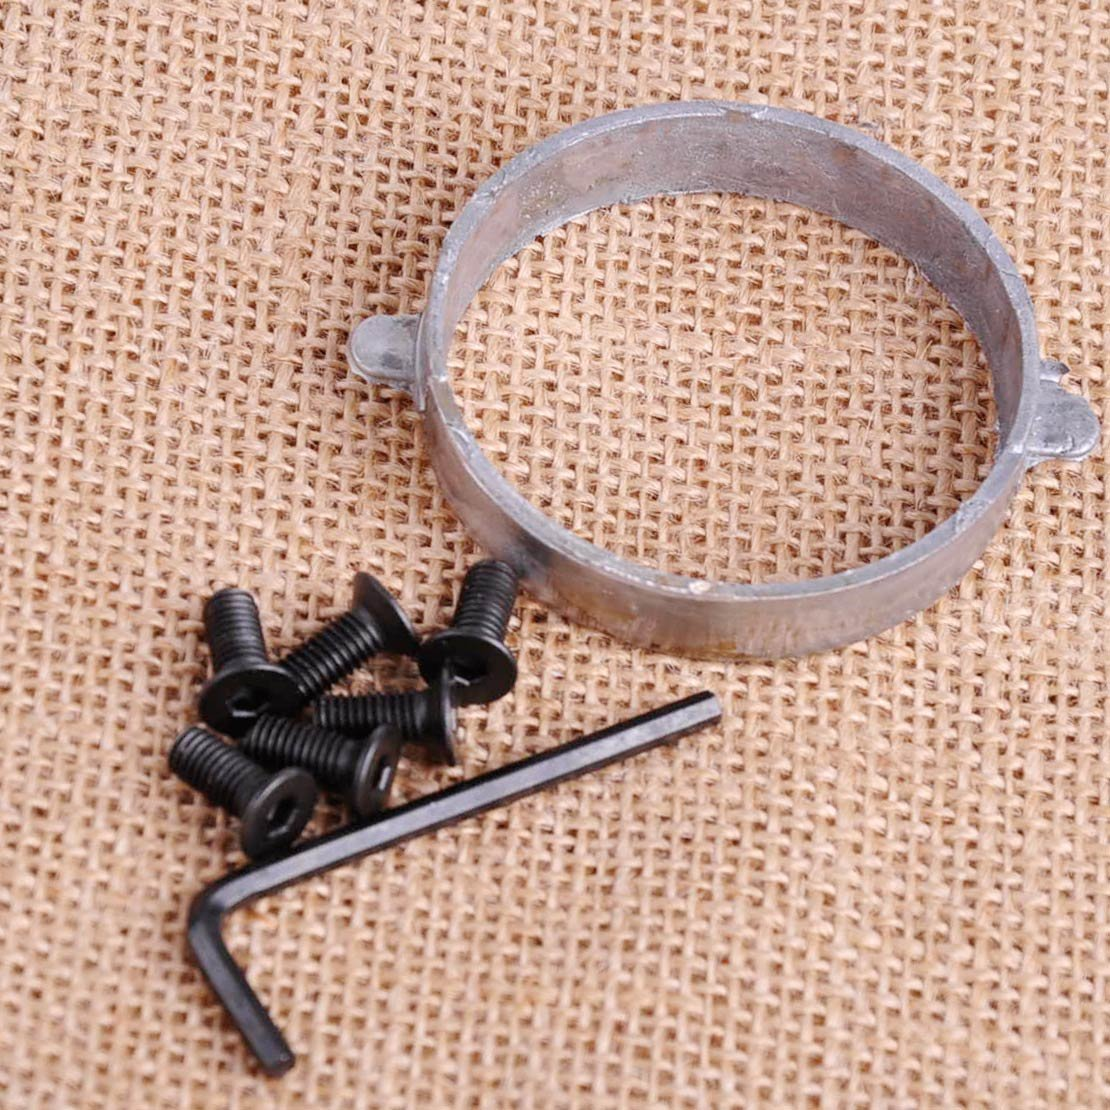 Steering Wheel Hub Adapter Boss Kit for Nissan 240SX 300ZX Maxima 1990 1991 1992 1993 1994 1995 1996 Pulsar 1987-1990 SalaBox-Accessories